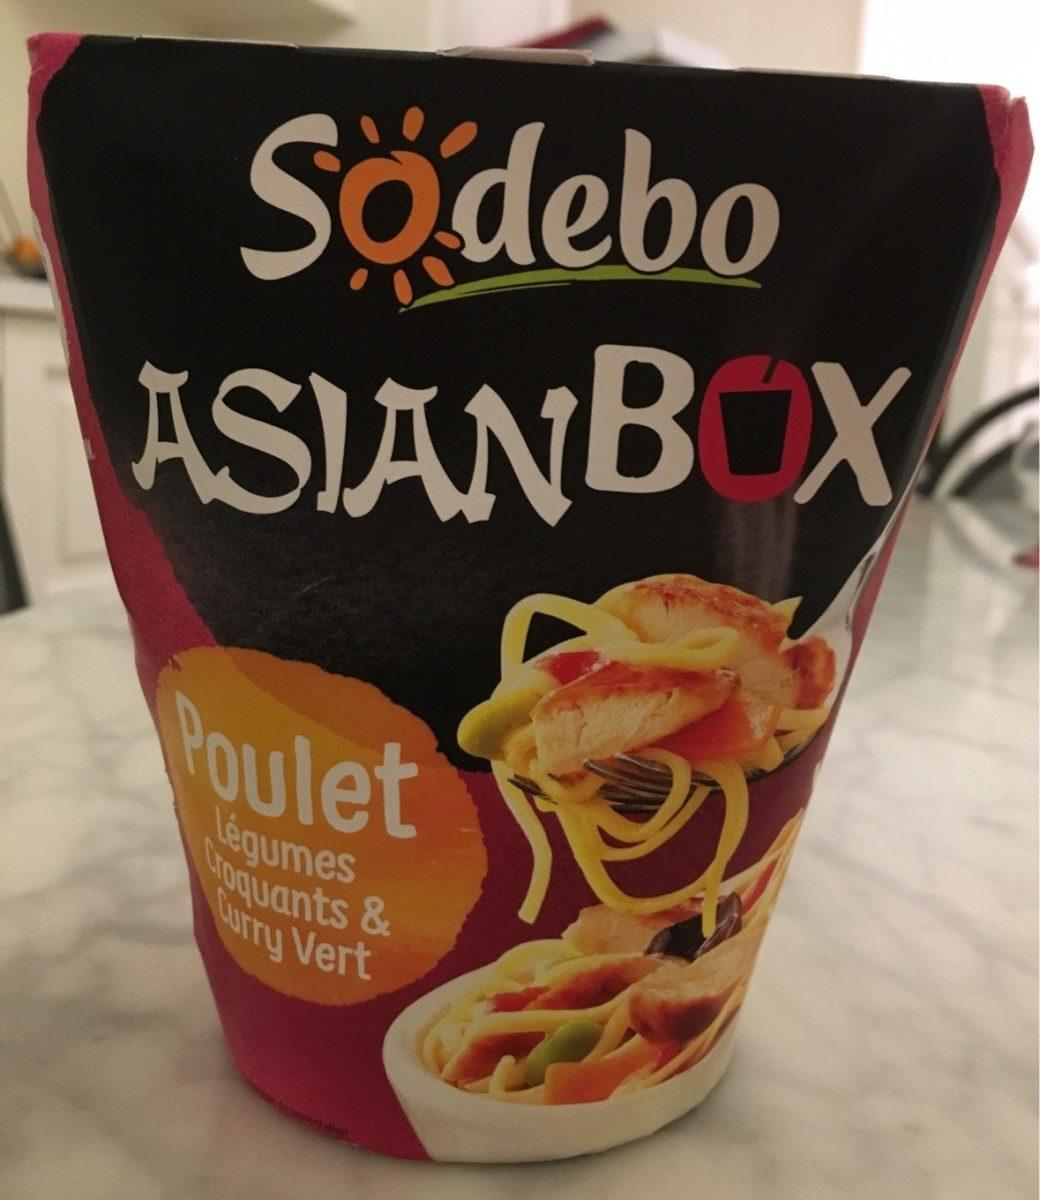 AsianBox Poulet legumes croquants & curry vert - Product - fr